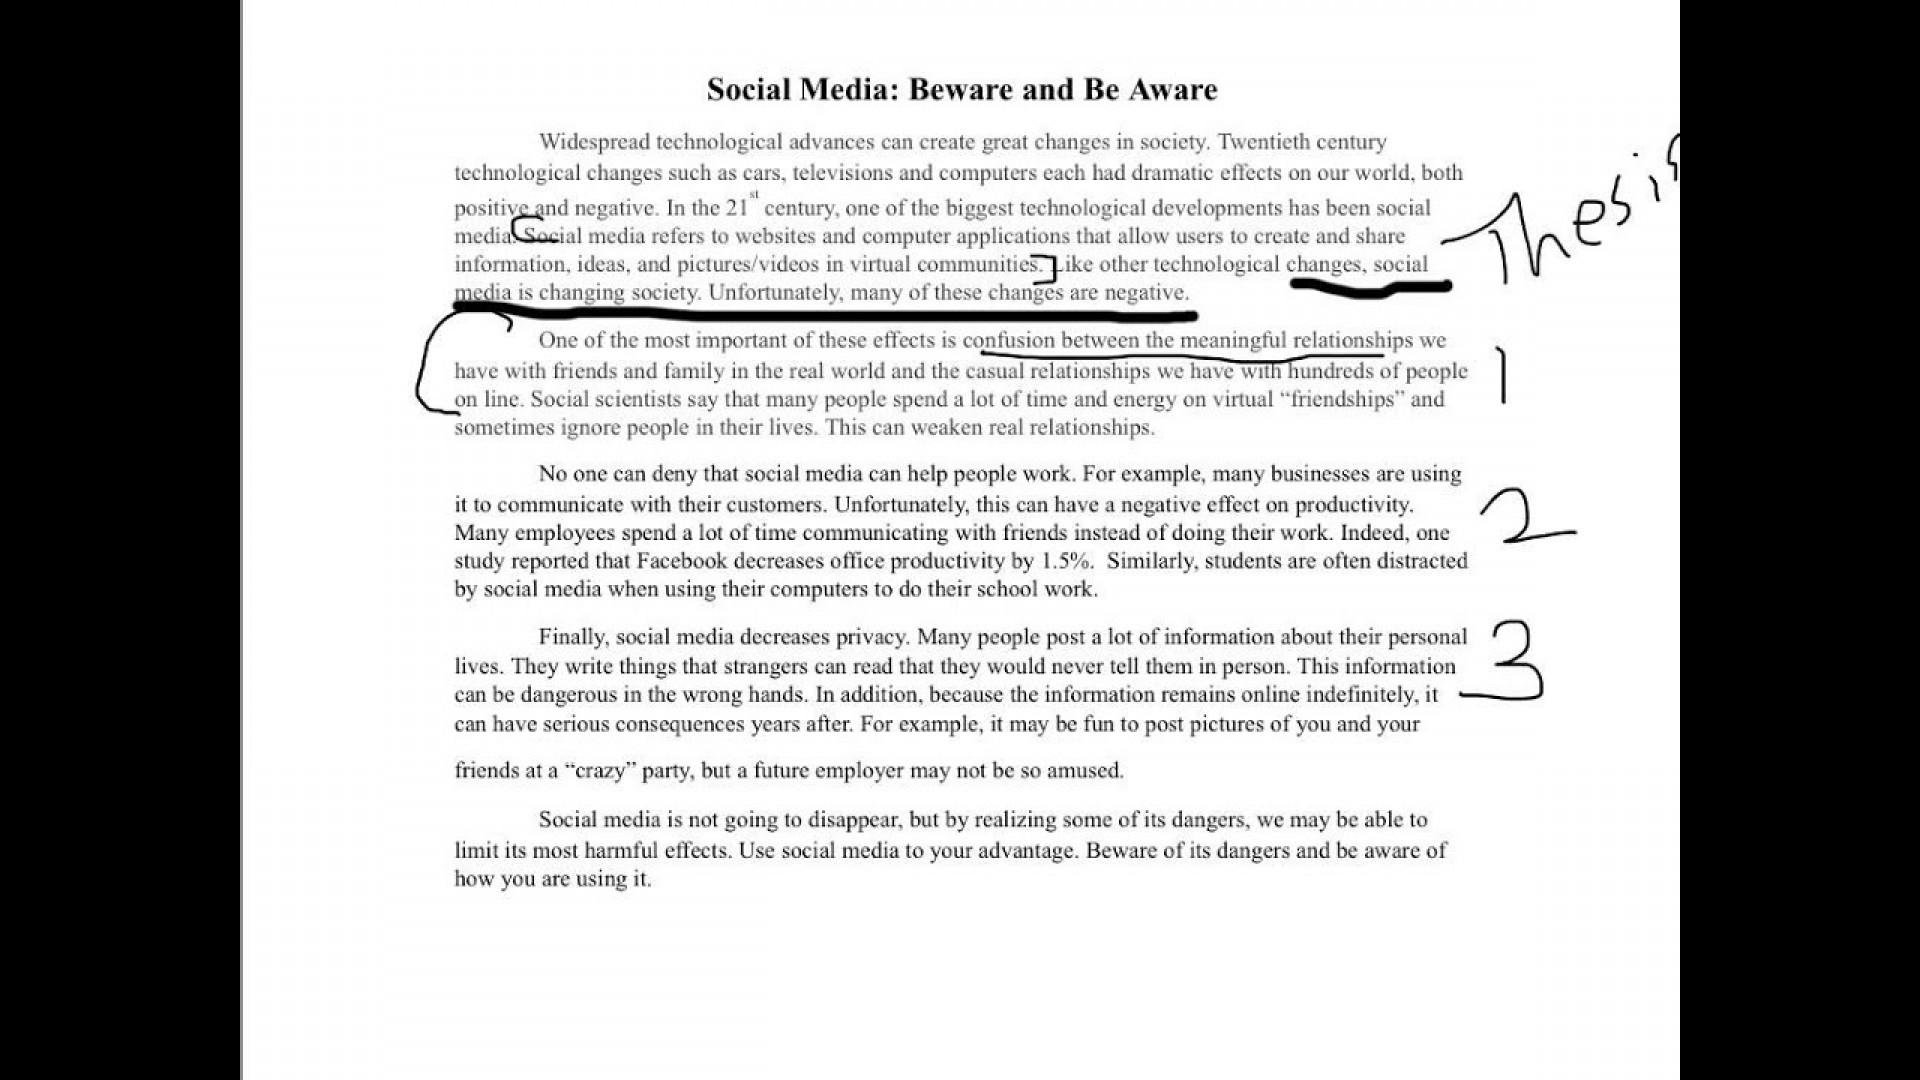 008 Satire Essay On Social Media Maxresdefault Unbelievable 1920